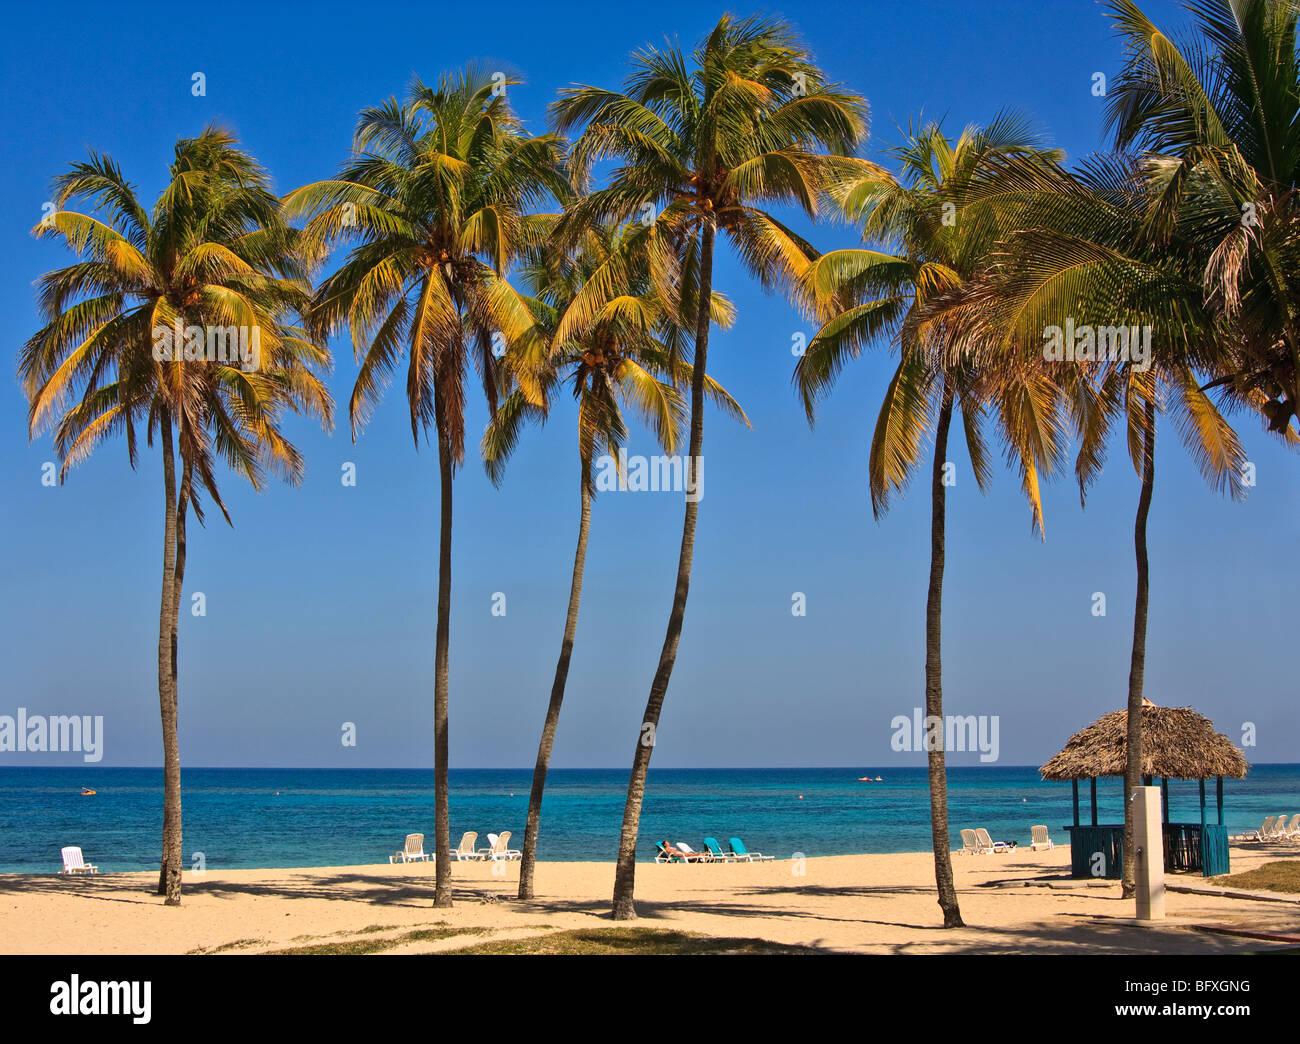 Tall palm trees on a Cuban beach - Stock Image